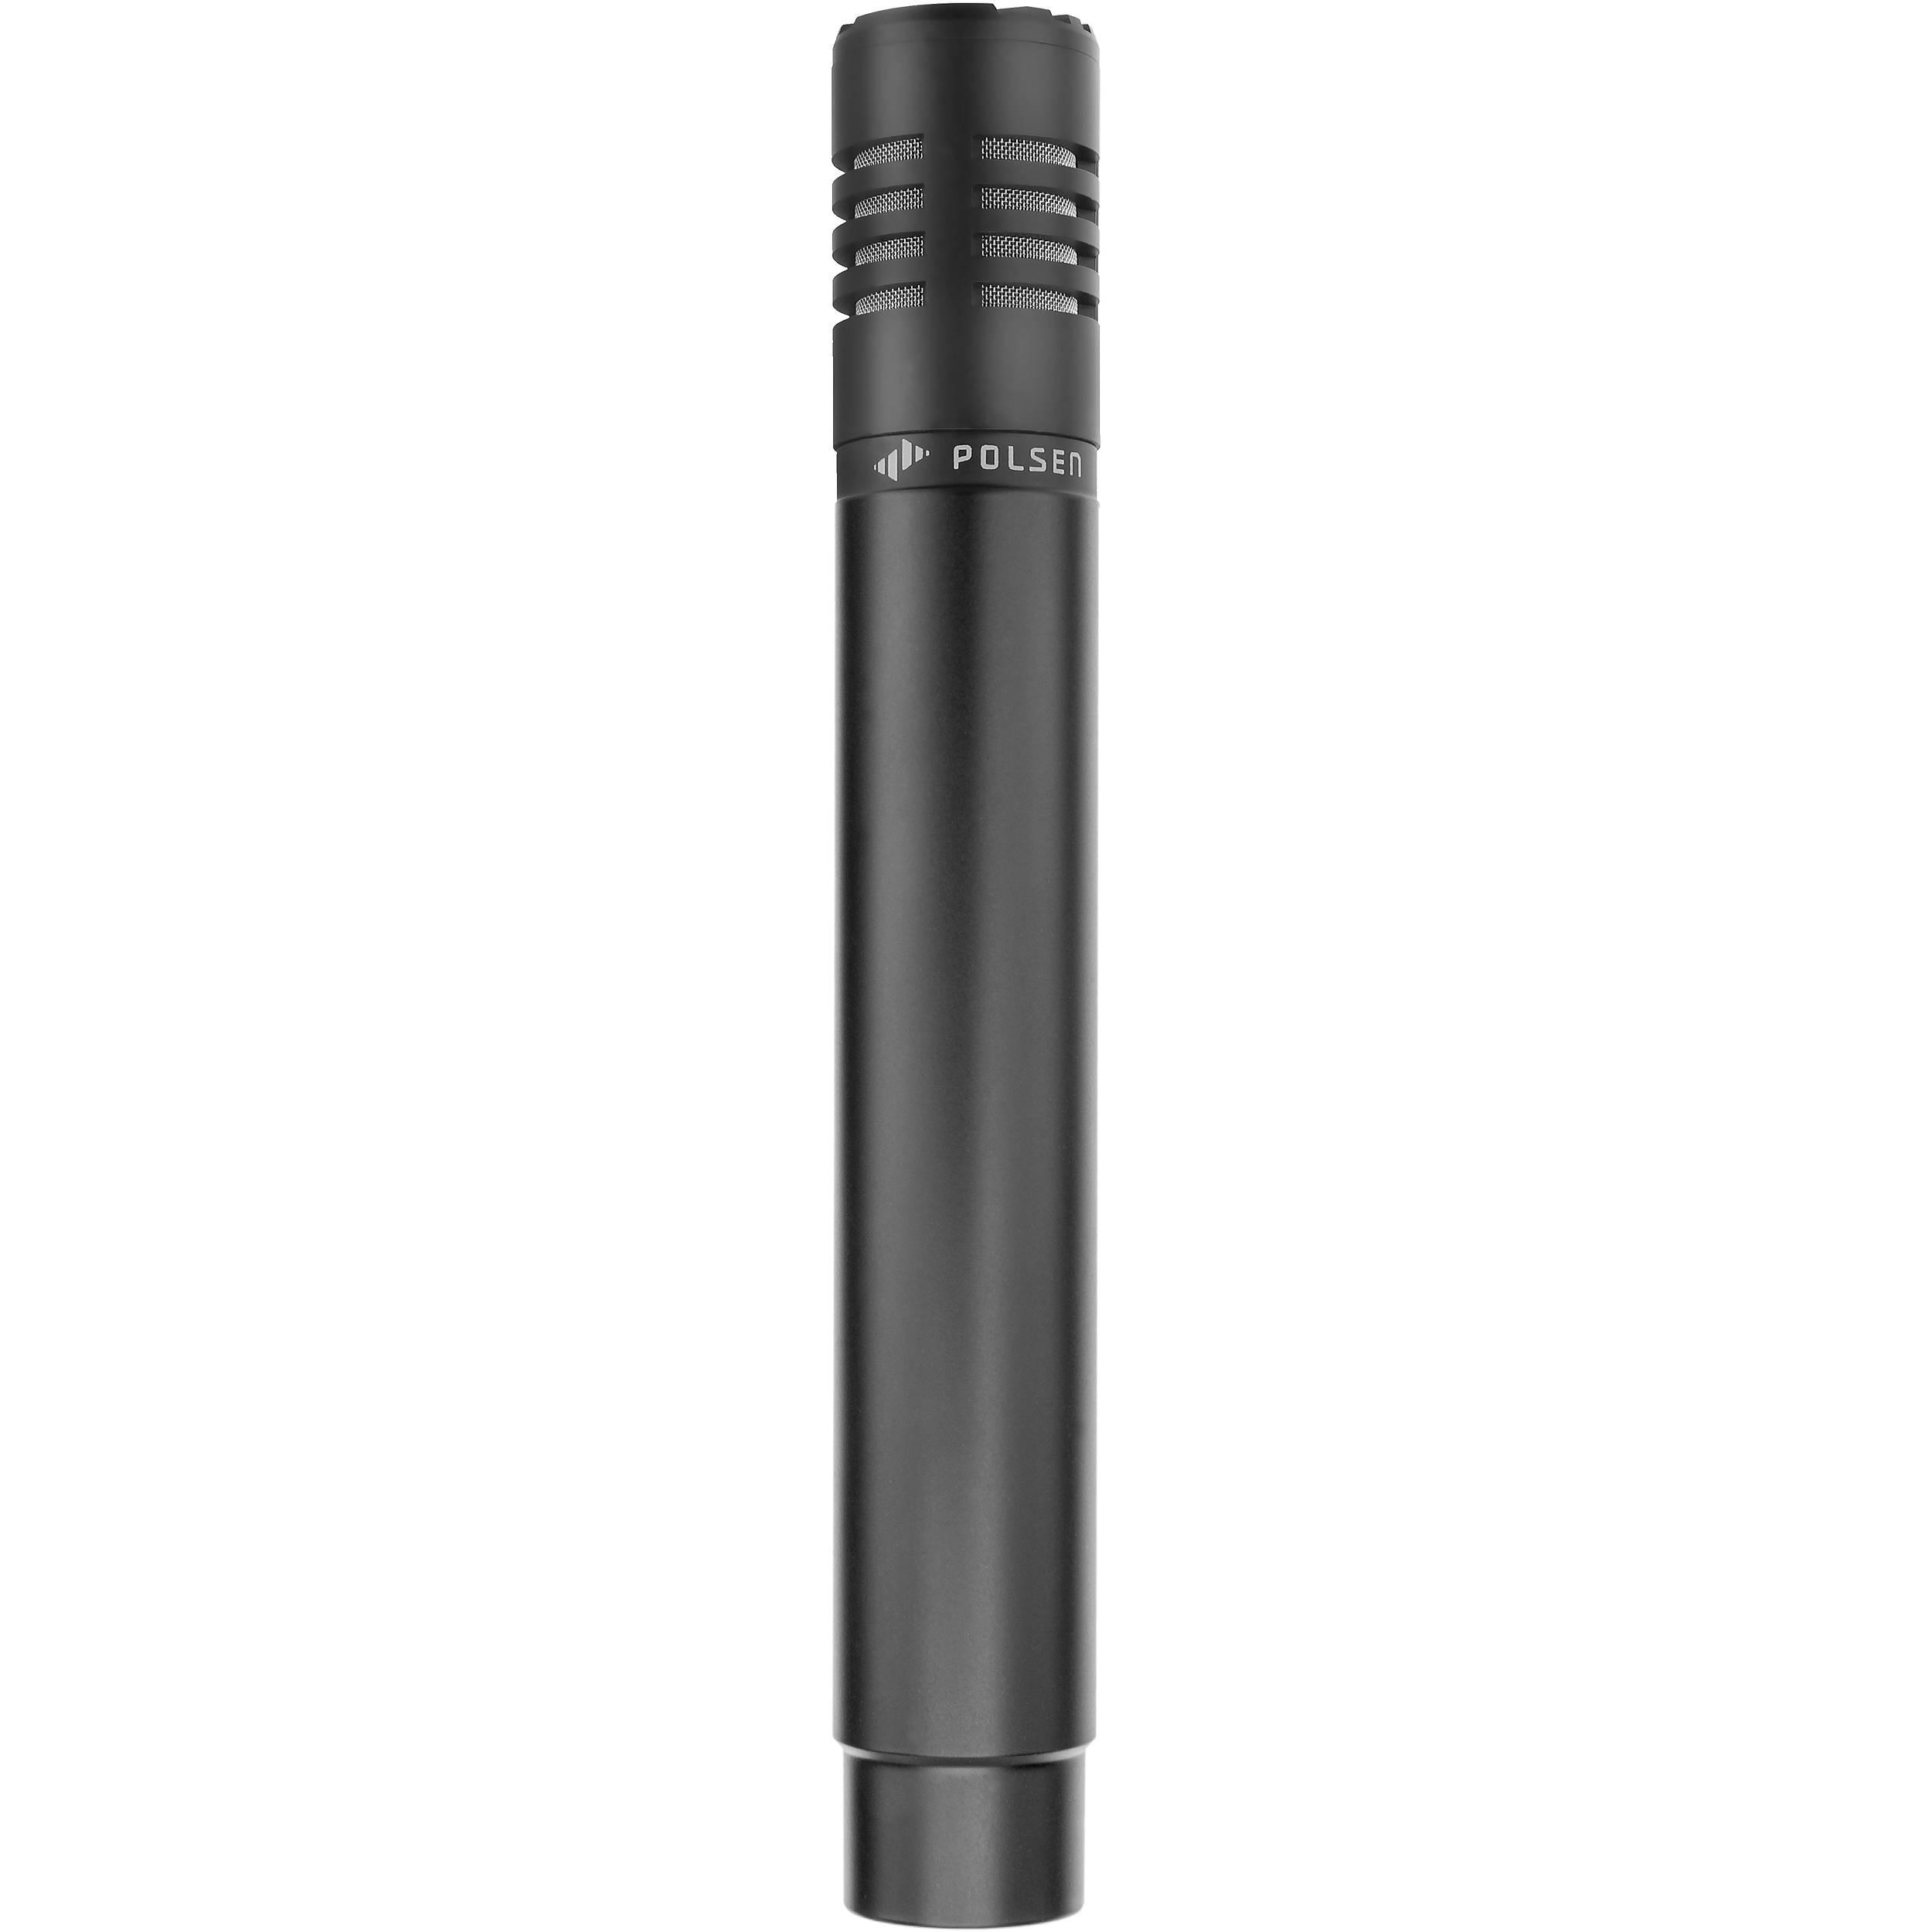 Small Diaphragm Condensor : polsen sdc 2150 small diaphragm condenser microphone sdc 2150 ~ Vivirlamusica.com Haus und Dekorationen